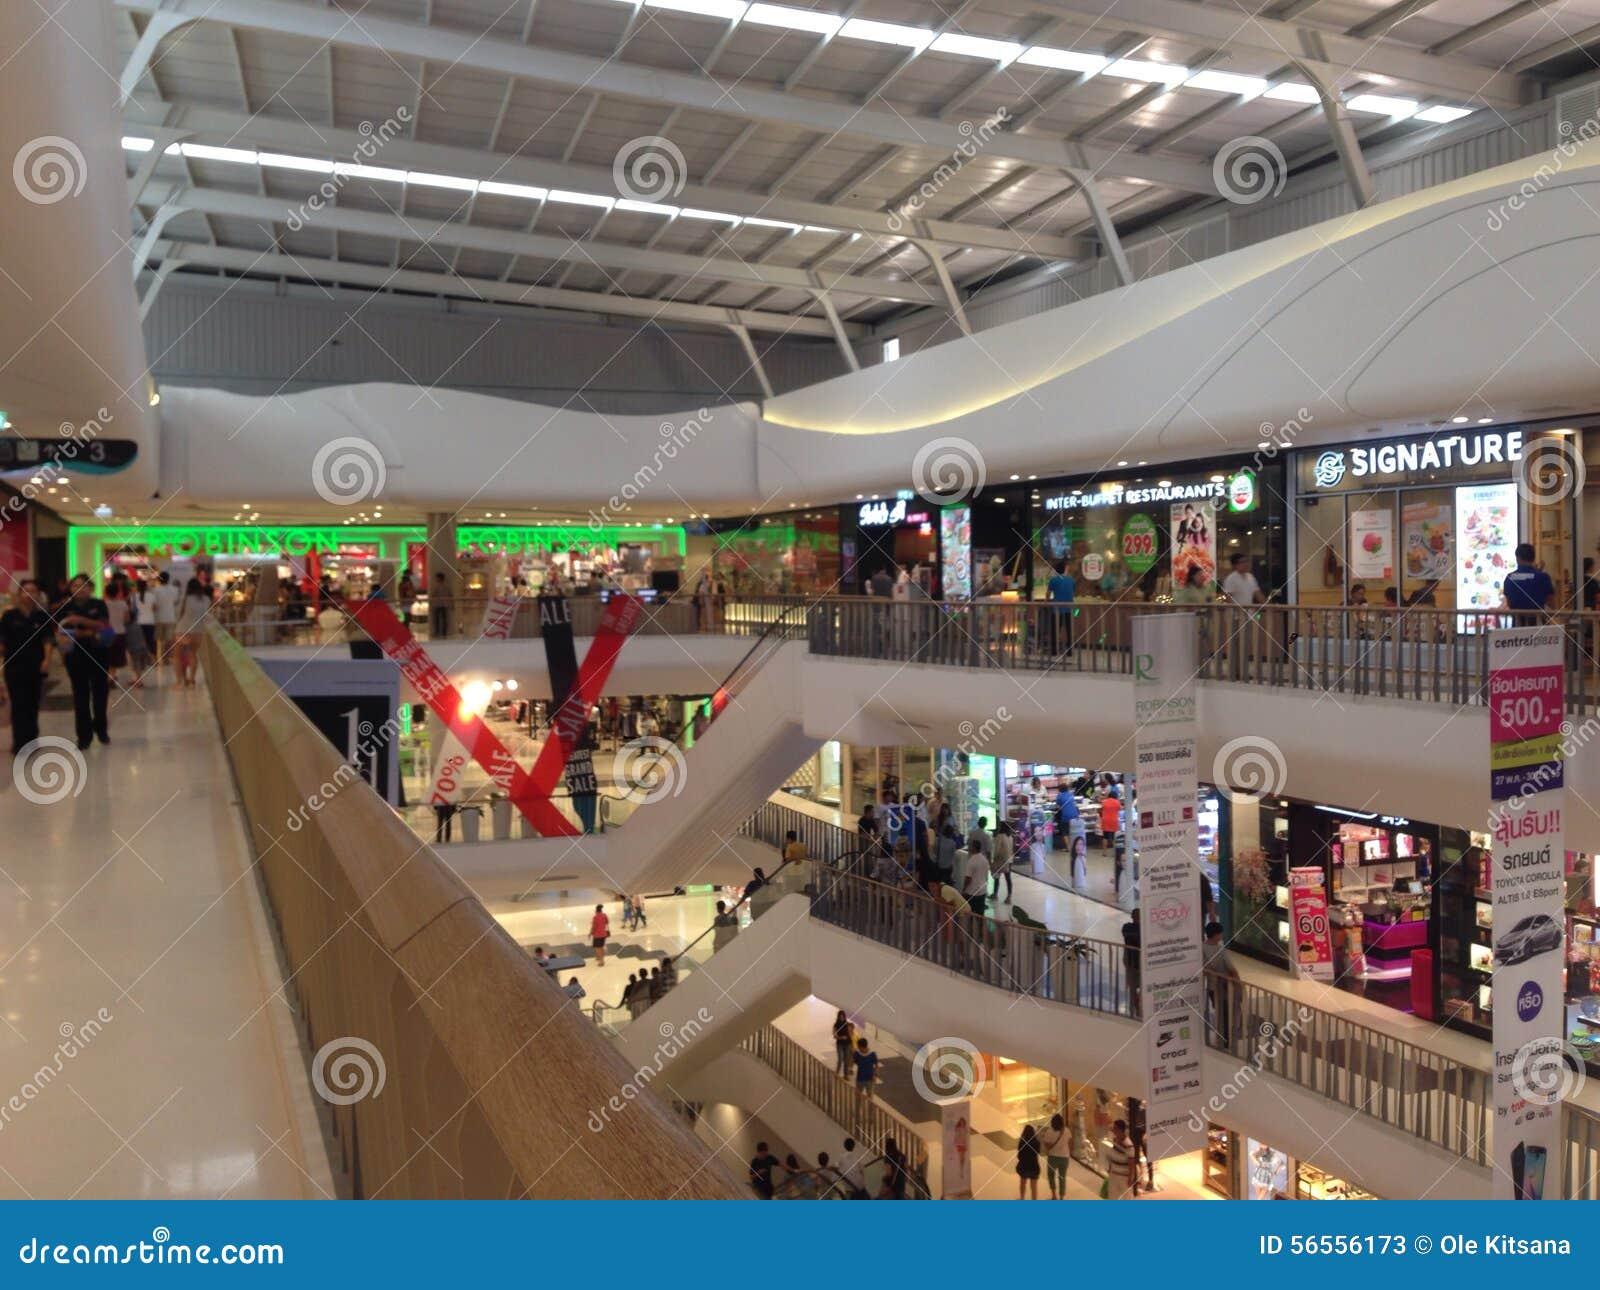 Download Άποψη λεωφόρων αγορών εκδοτική στοκ εικόνες. εικόνα από αγορές - 56556173